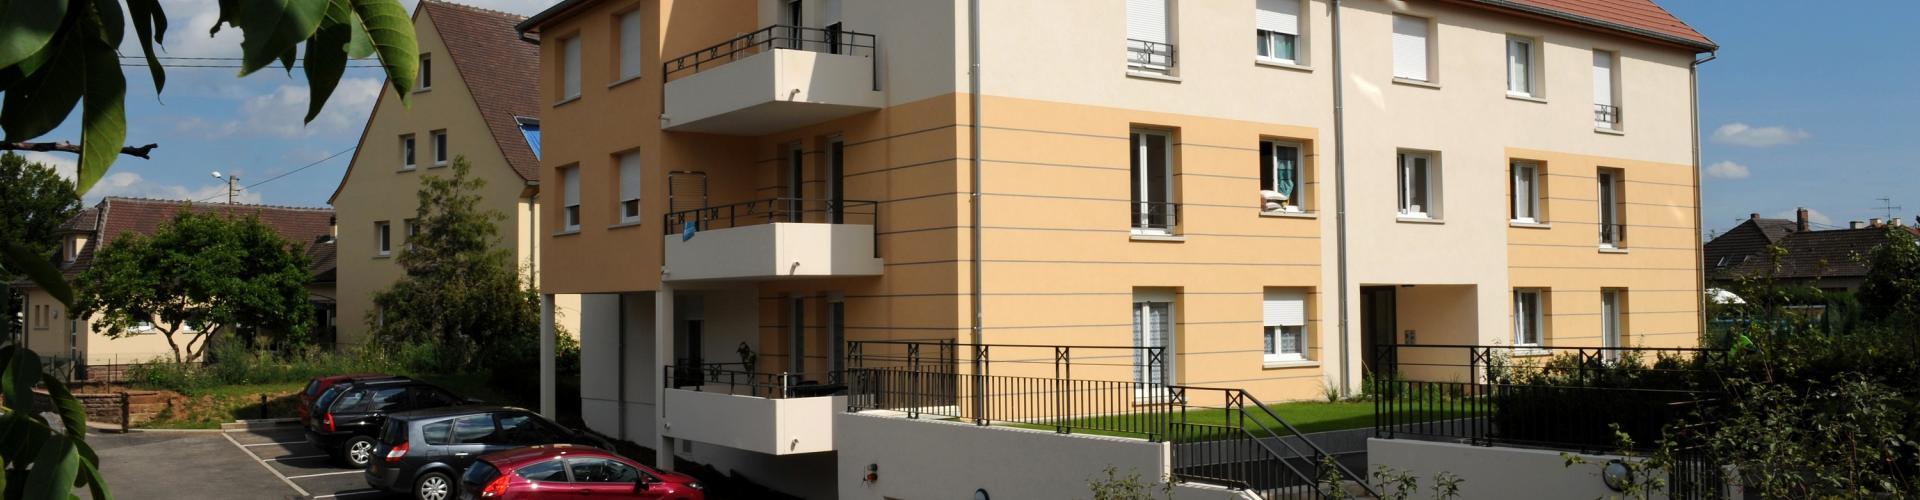 Programme immobilier neuf Barr - Le Blason